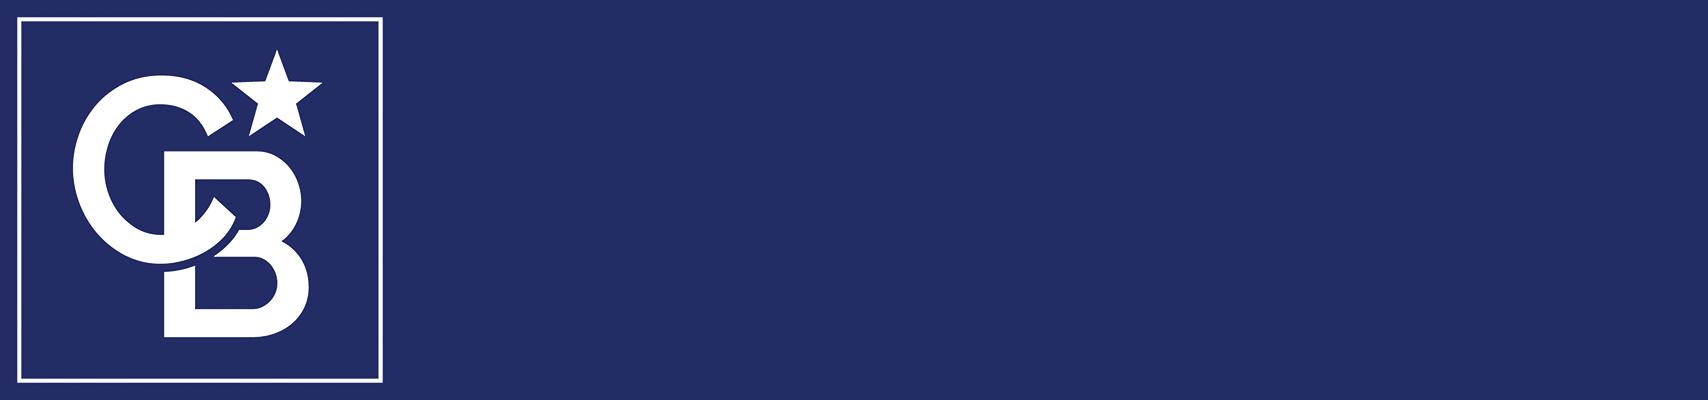 Patricia Enterrios - Coldwell Banker Sky Ridge Realty Logo